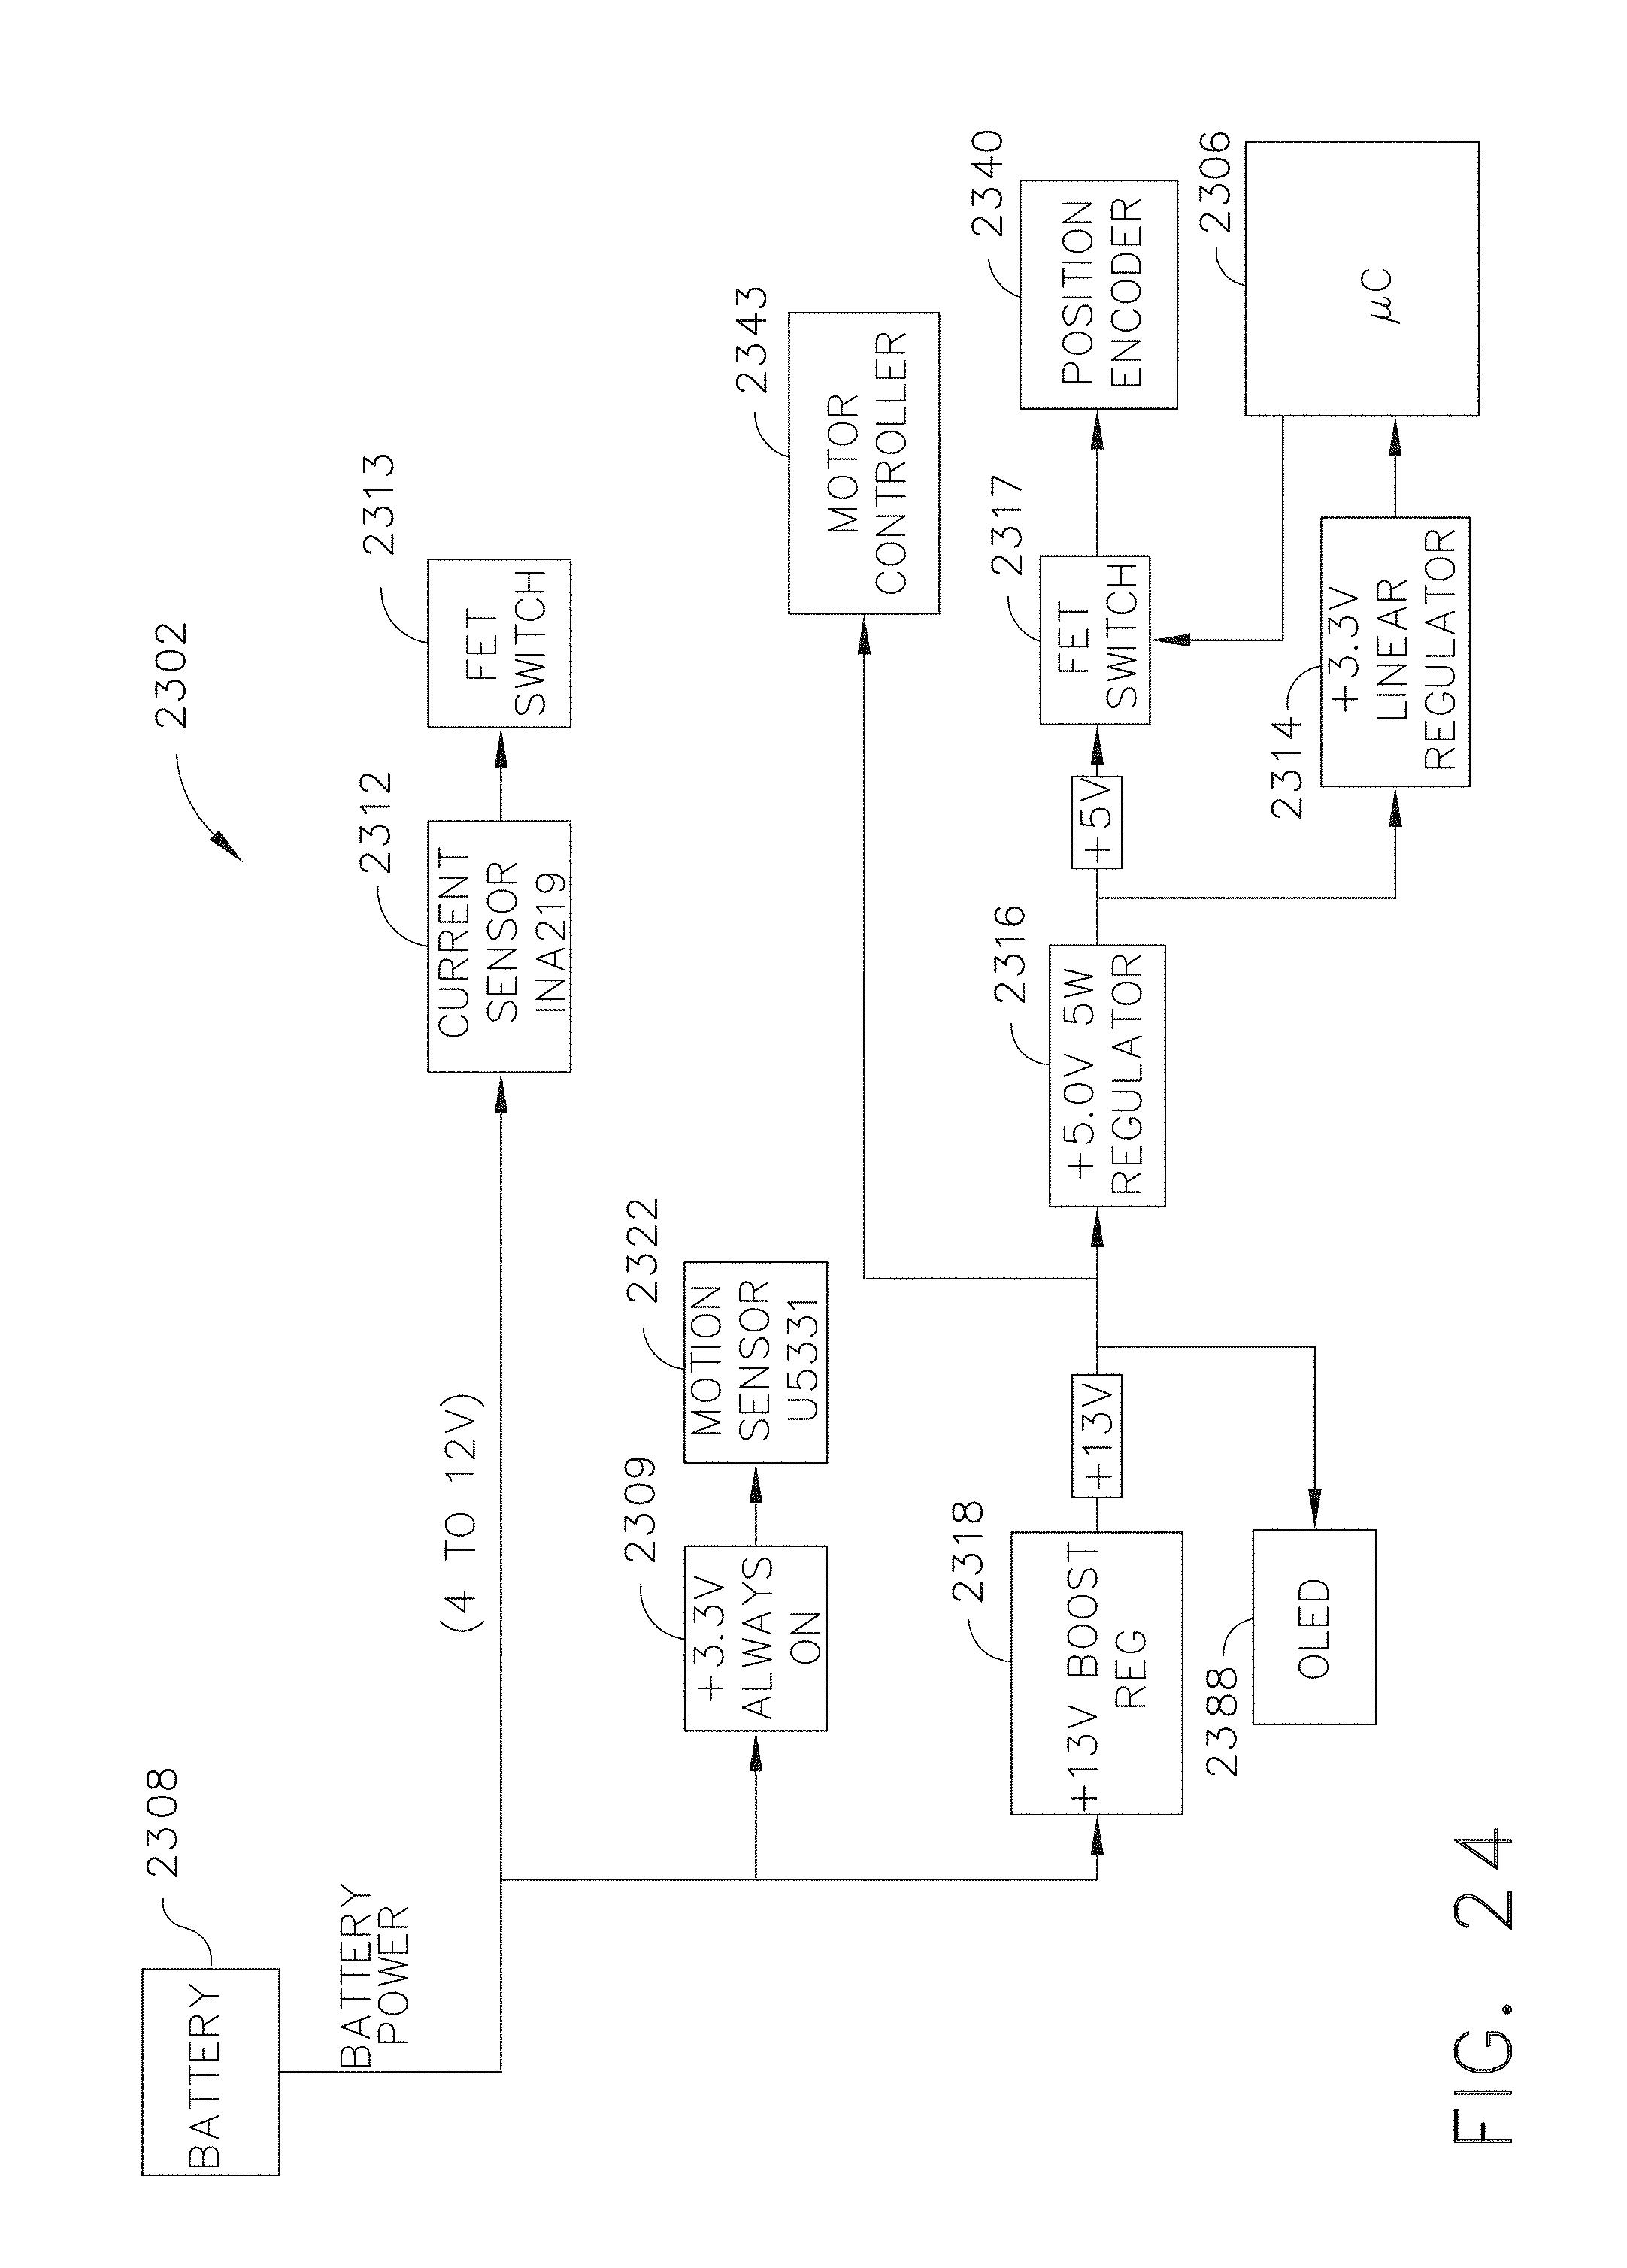 Patent US 10,016,199 B2